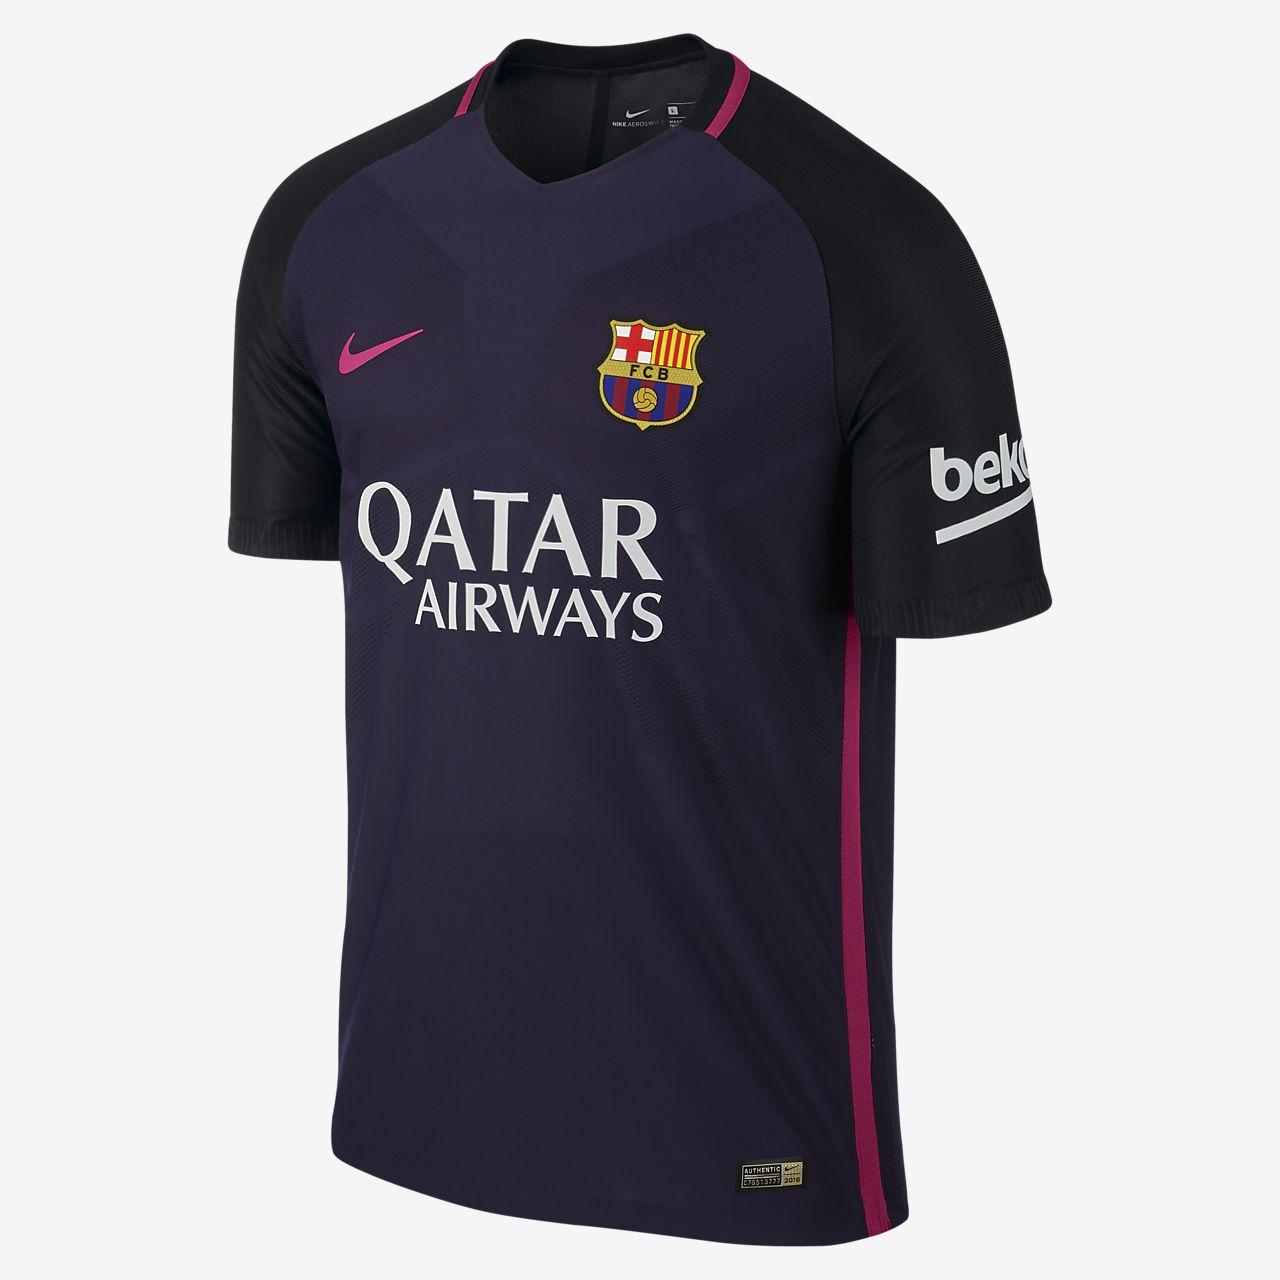 Camiseta de fútbol para hombre FC Barcelona Vapor de visitante para  jugadores 131ab0de9e4c3